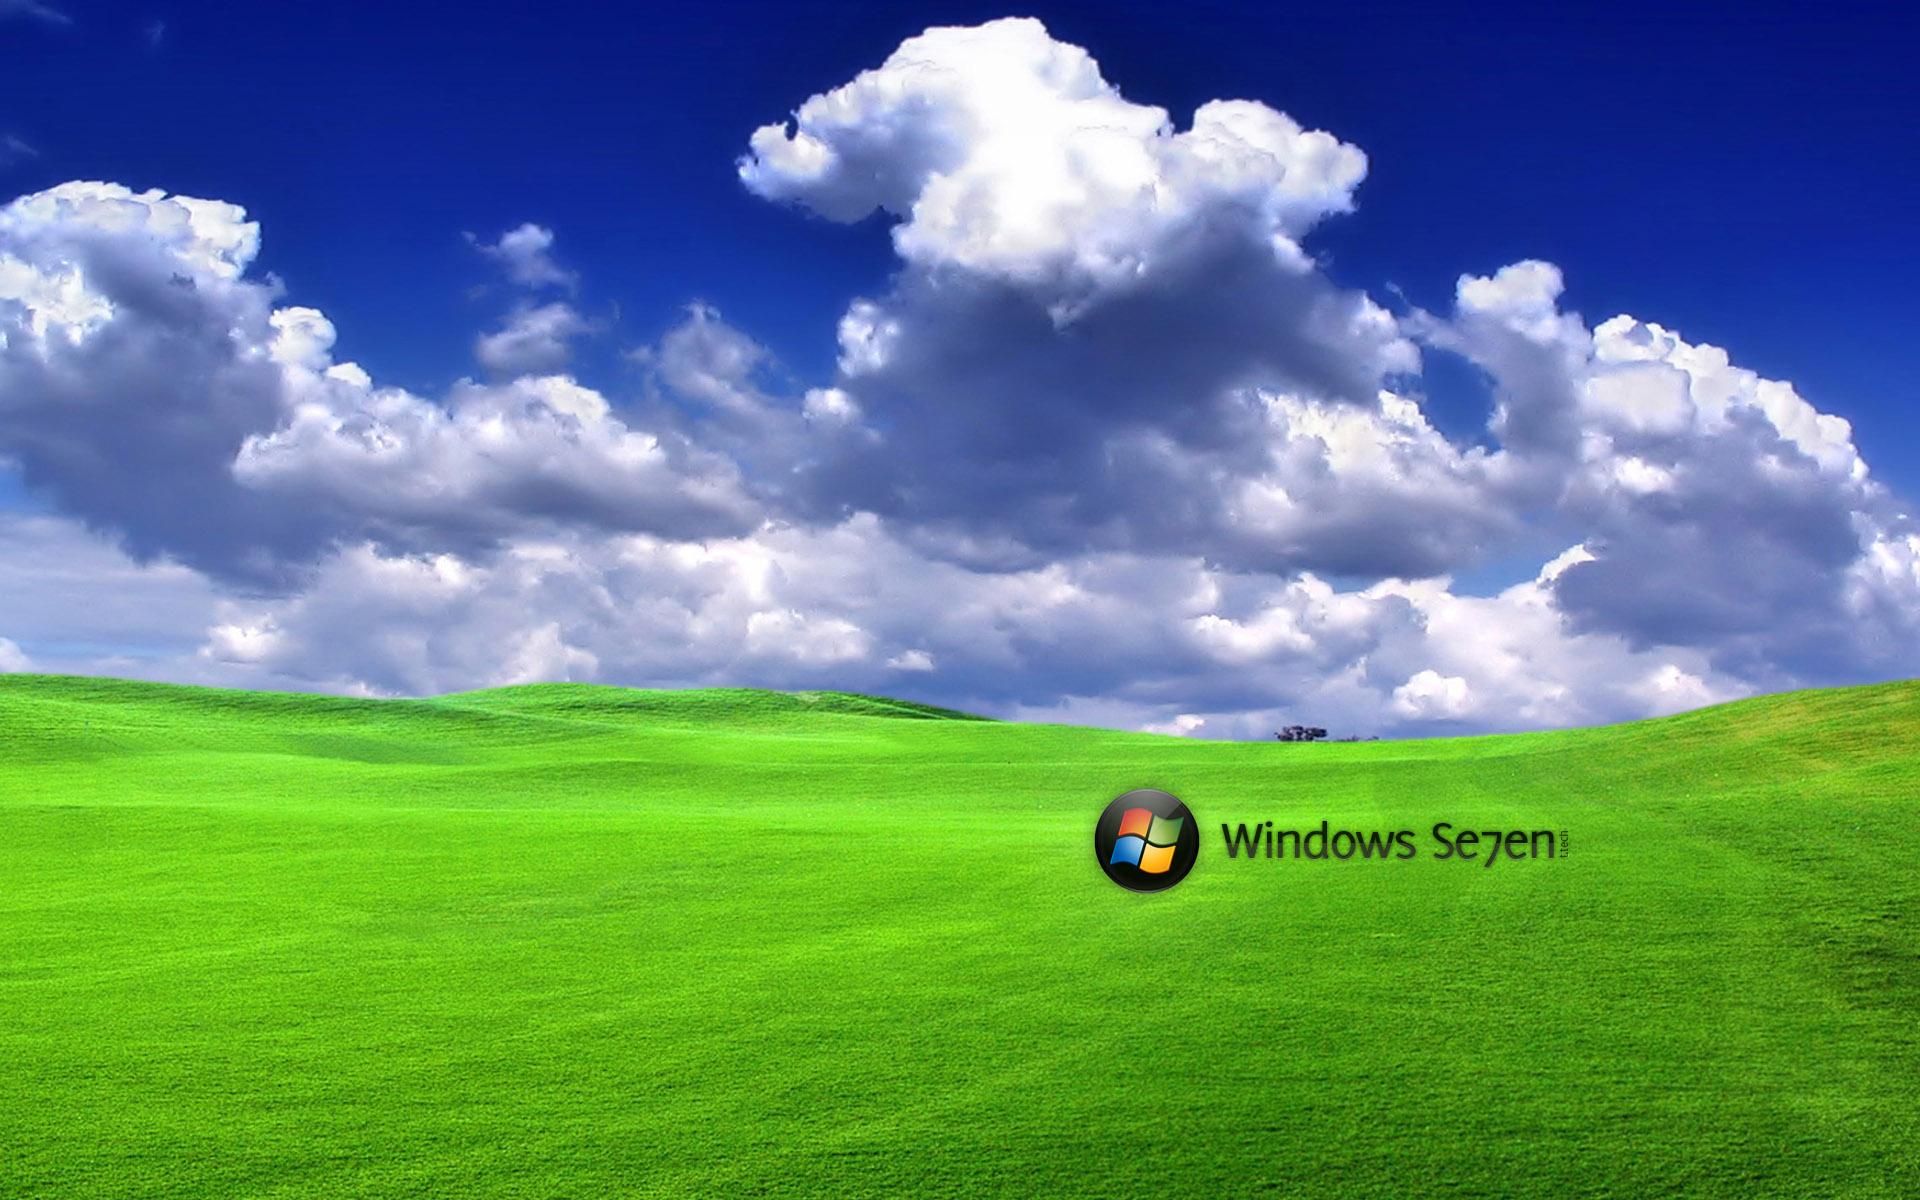 Windows 7 wallpapers hd wallpaper